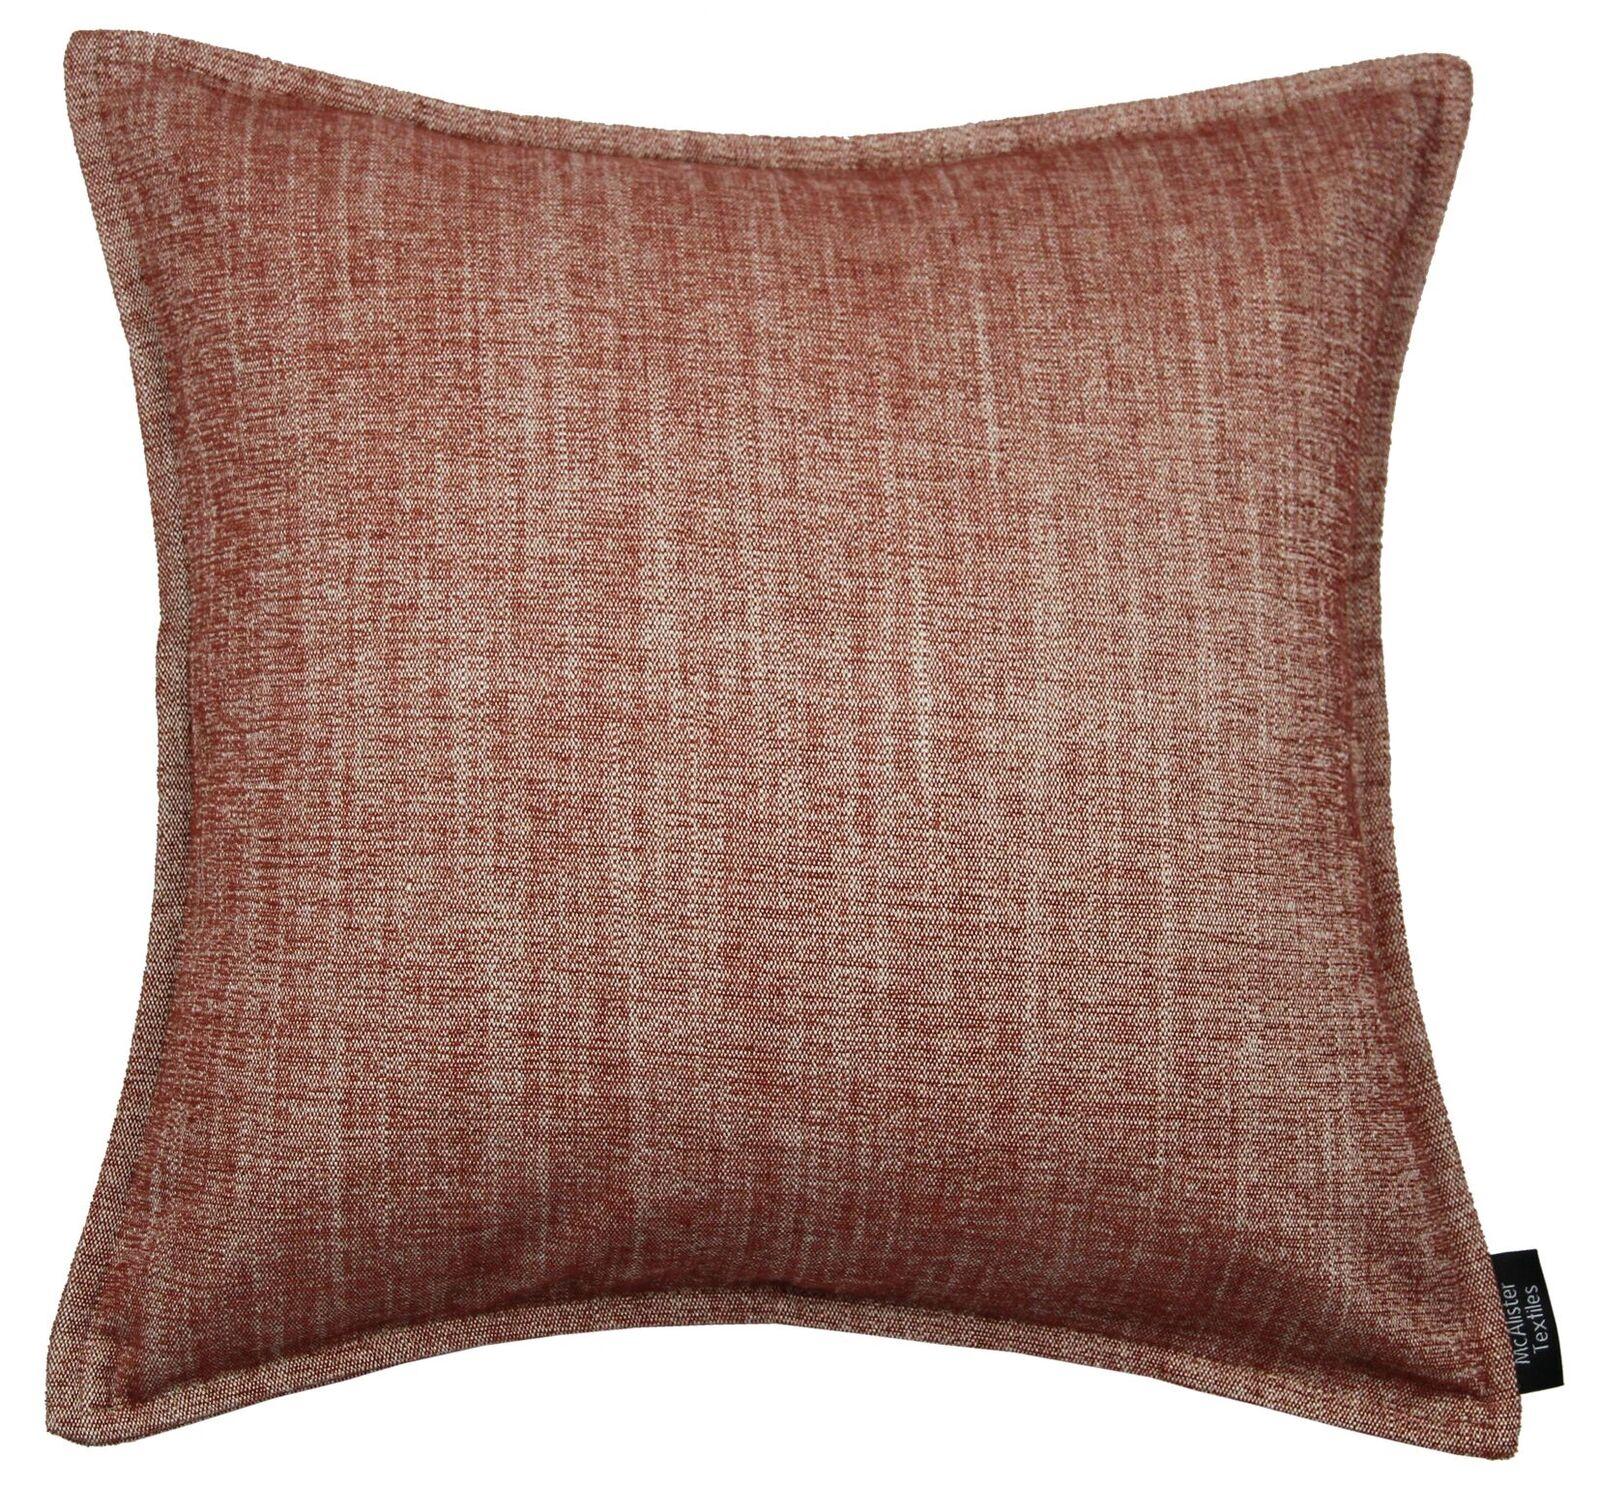 McAlister Textiles Rhumba Stonewashed Semi-Semplice Strutturata Arancione Bruciato Stonewashed Rhumba Cuscino c39079